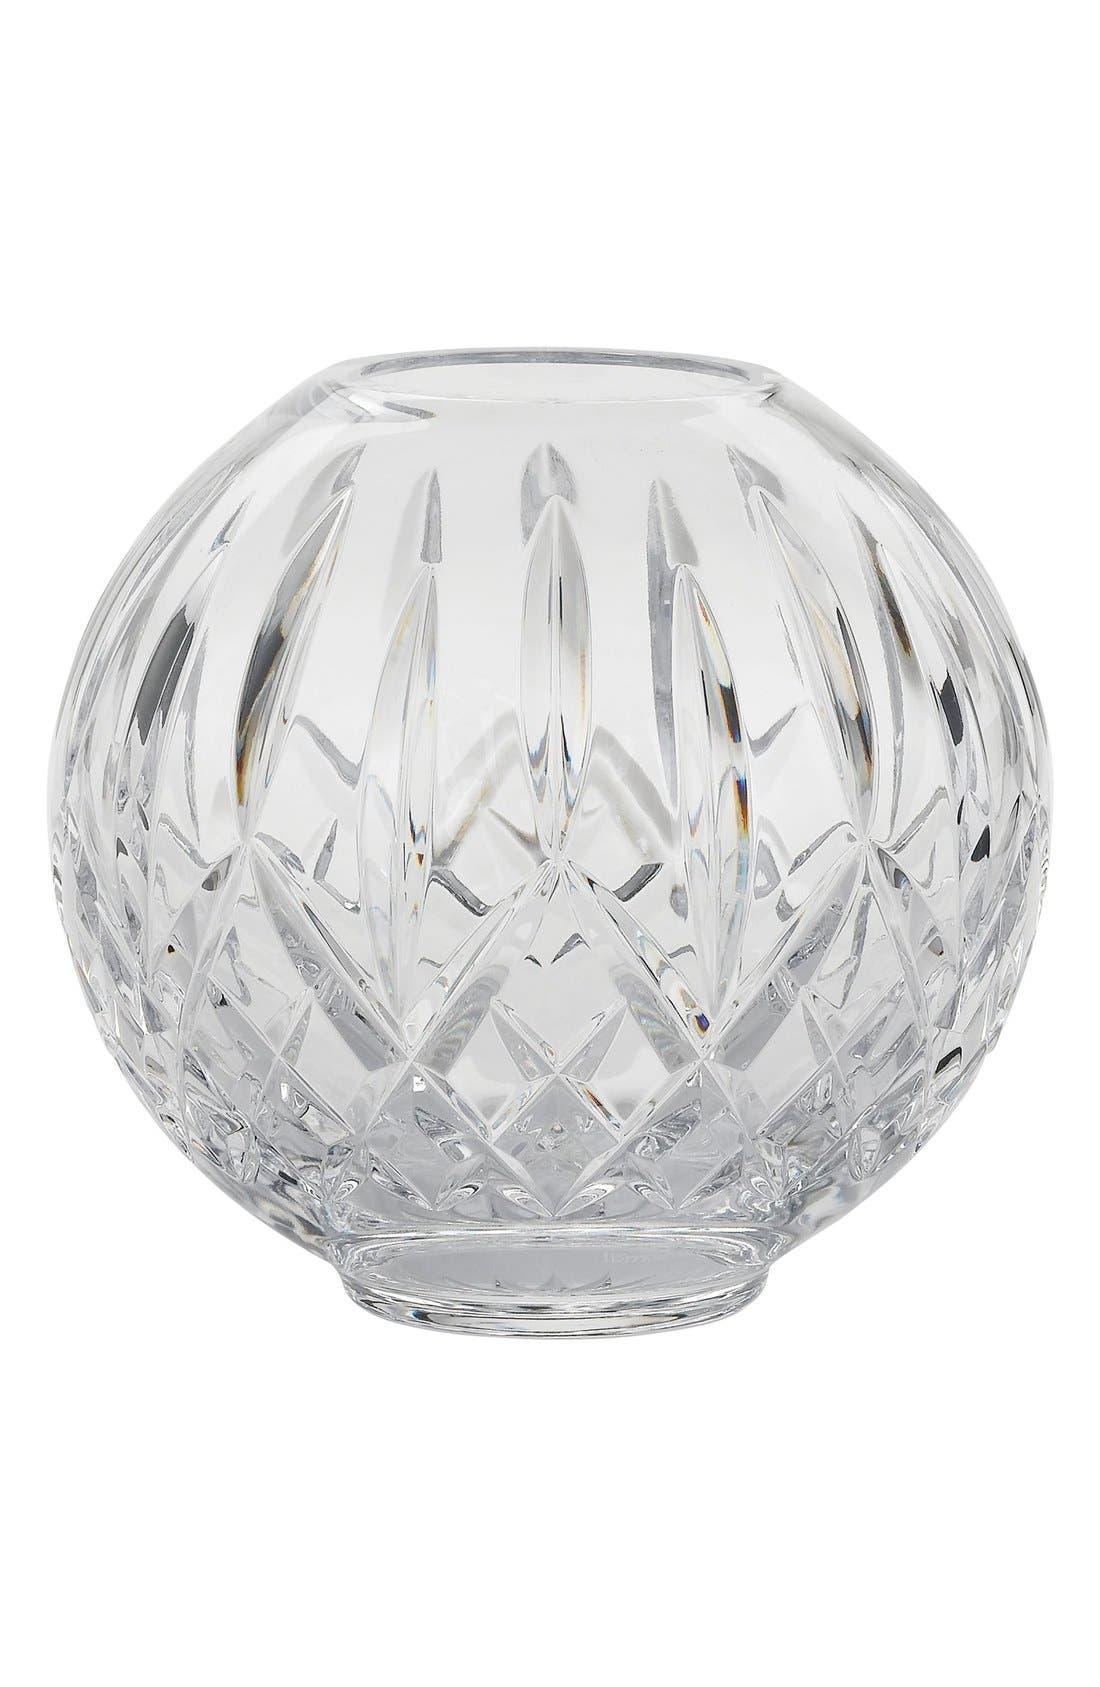 Main Image - Waterford 'Lismore' Lead Crystal Rose Bowl